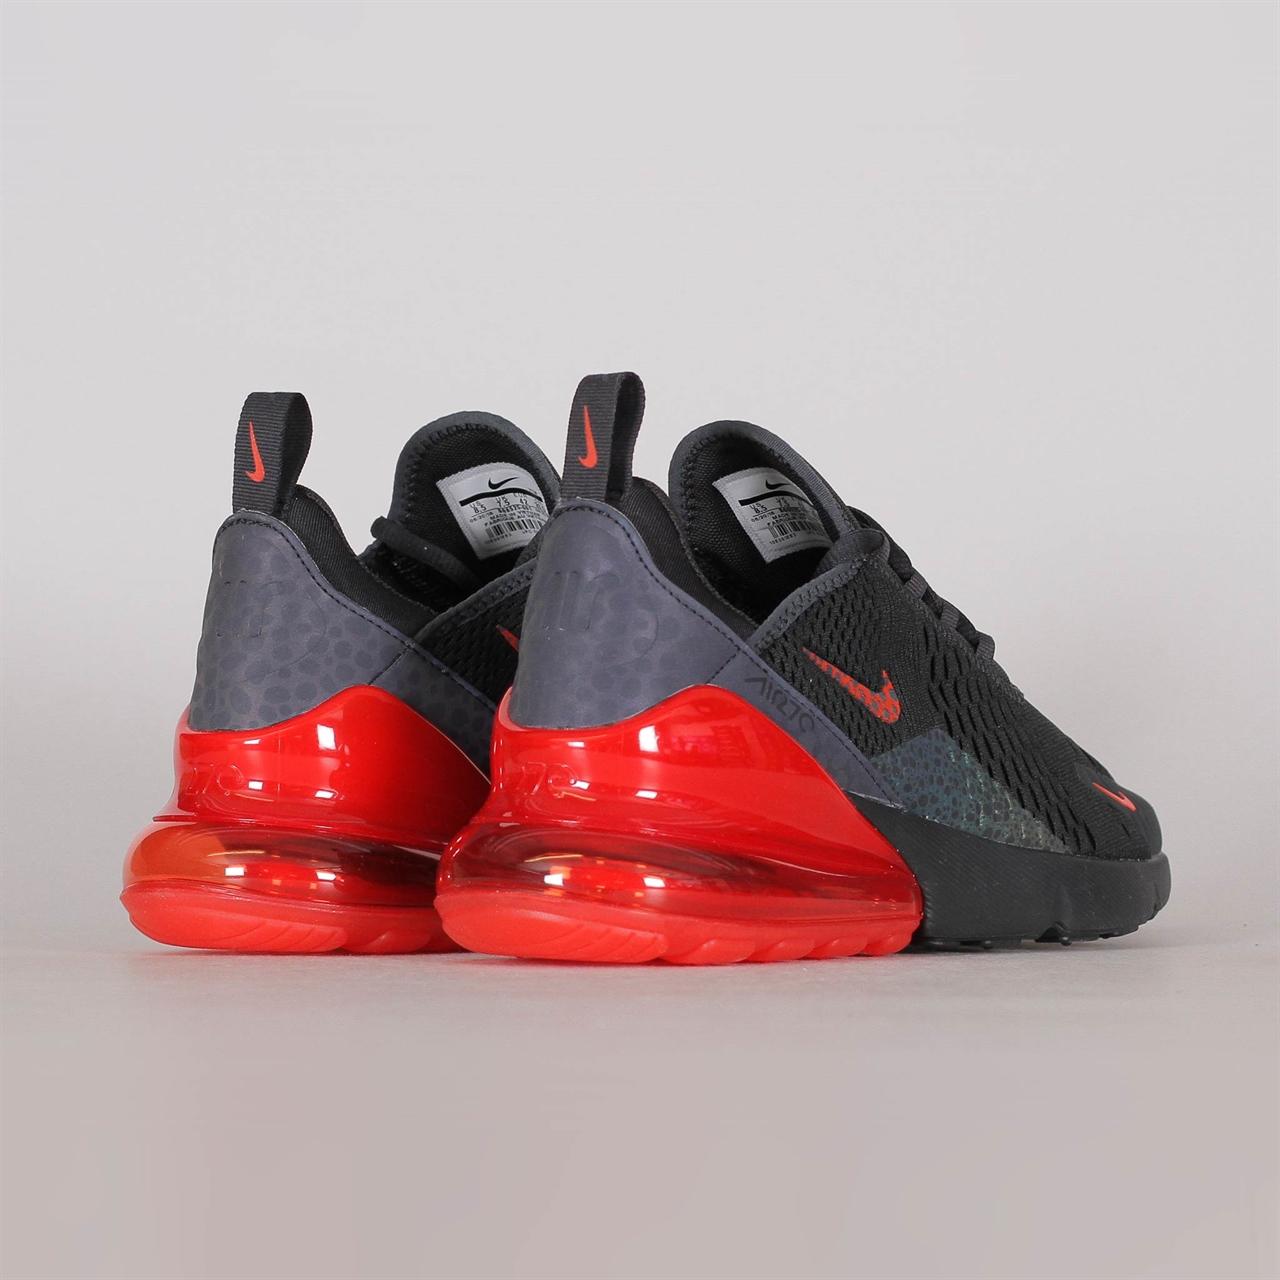 separation shoes 865f7 ffa17 Shelta - Nike Air Max 270 SE Reflective (BQ6525-001)